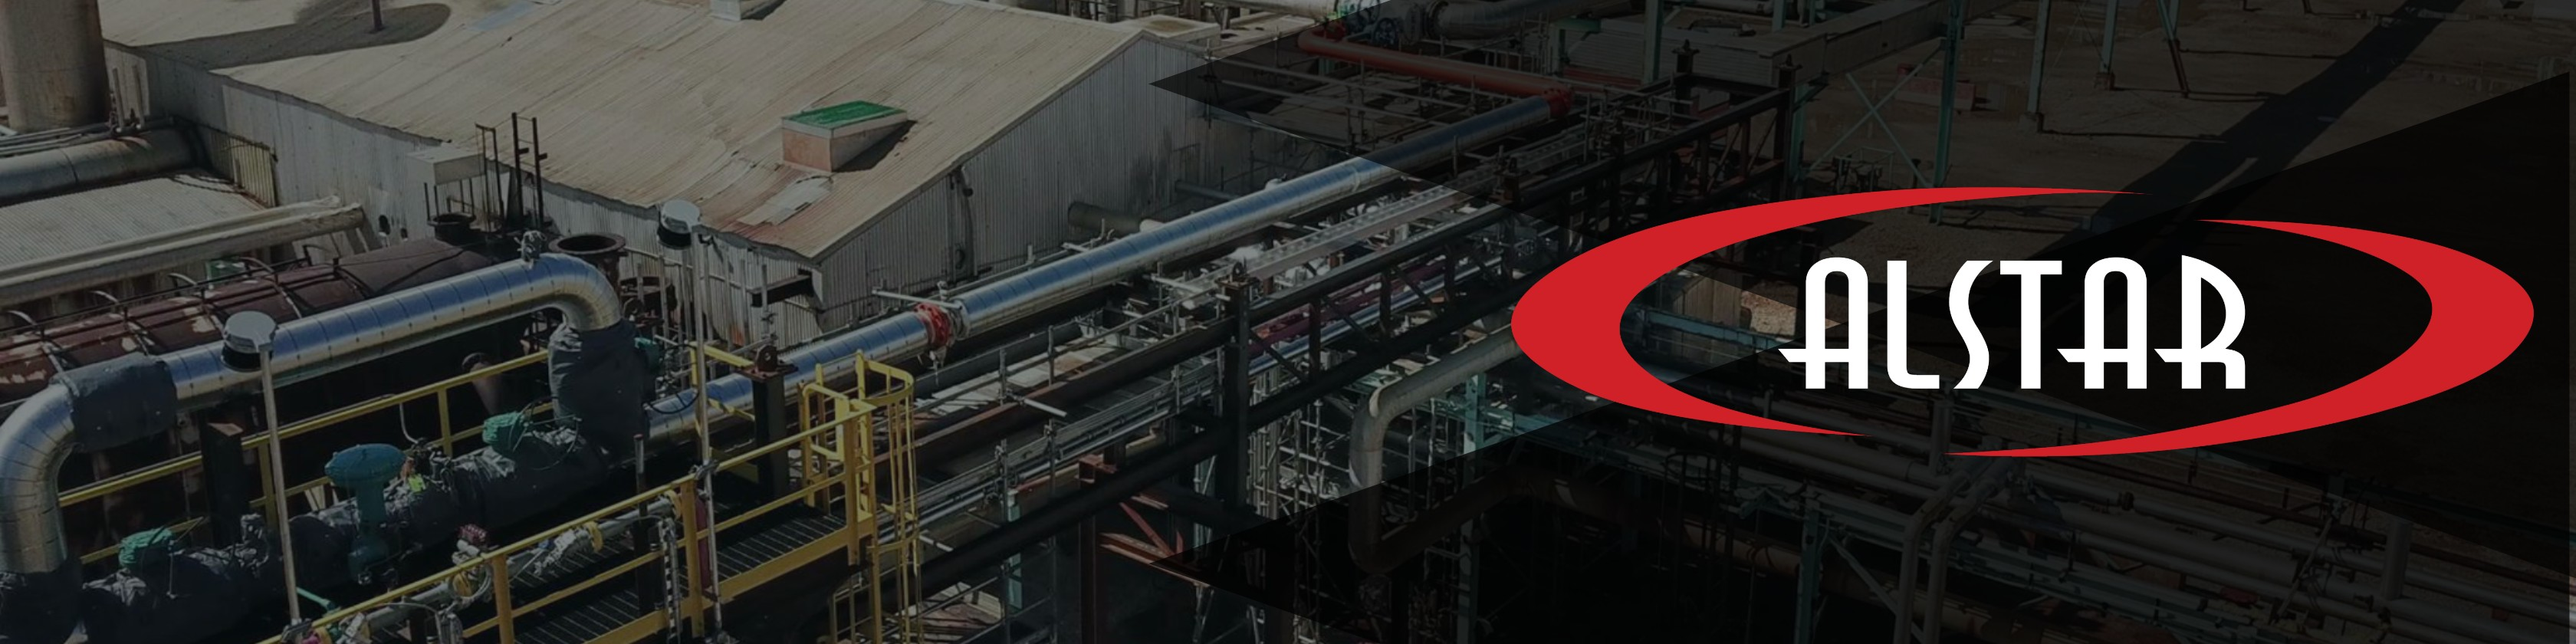 Alstar Oilfield Contractors Ltd    LinkedIn